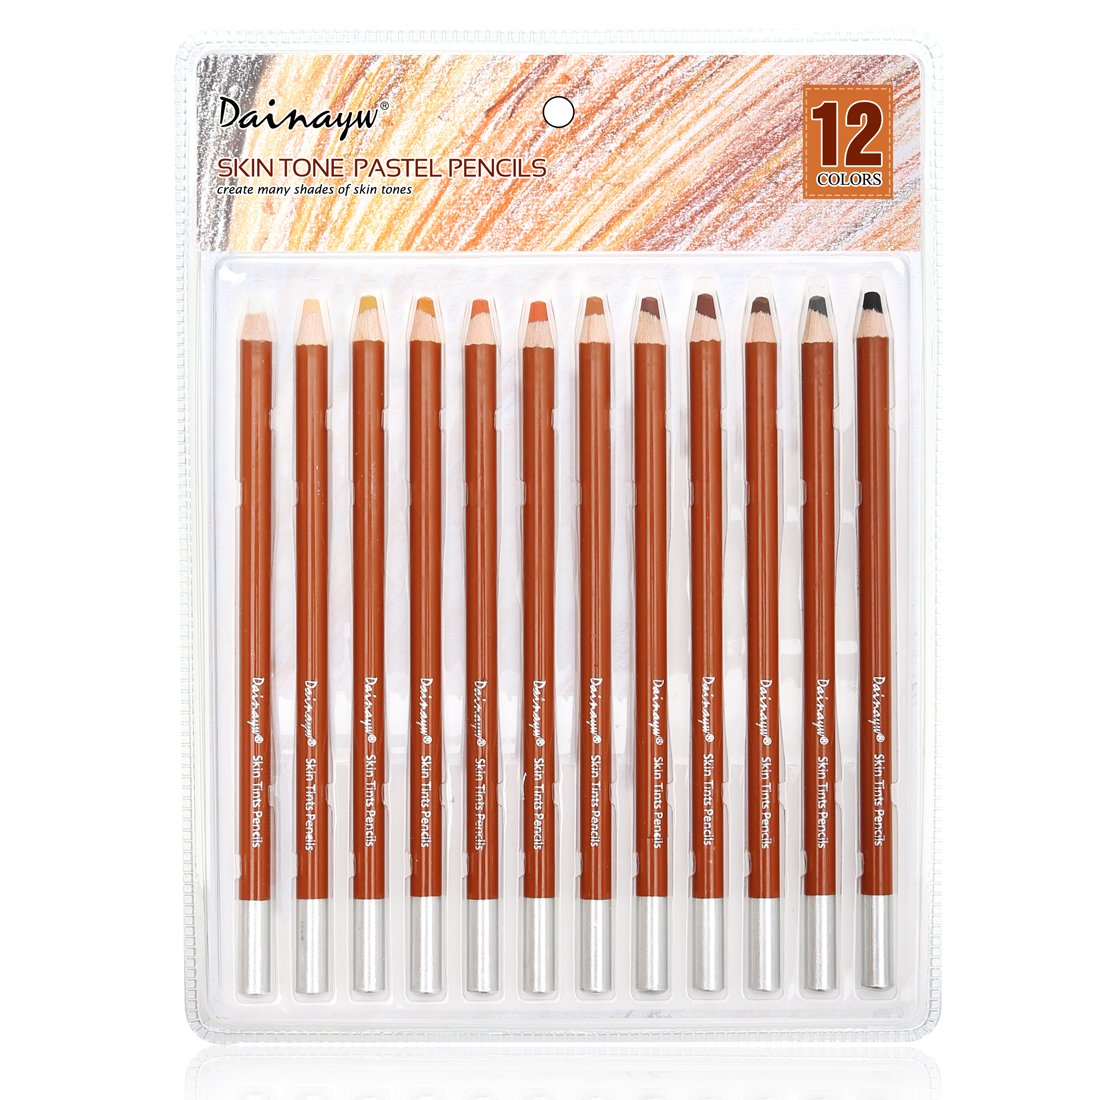 Dainayw Soft Skin Tone Pastel Pencils,5mm Core,12 Piece Premier Colored Pencils For Artist Drawing,Sketching - Portrait Set